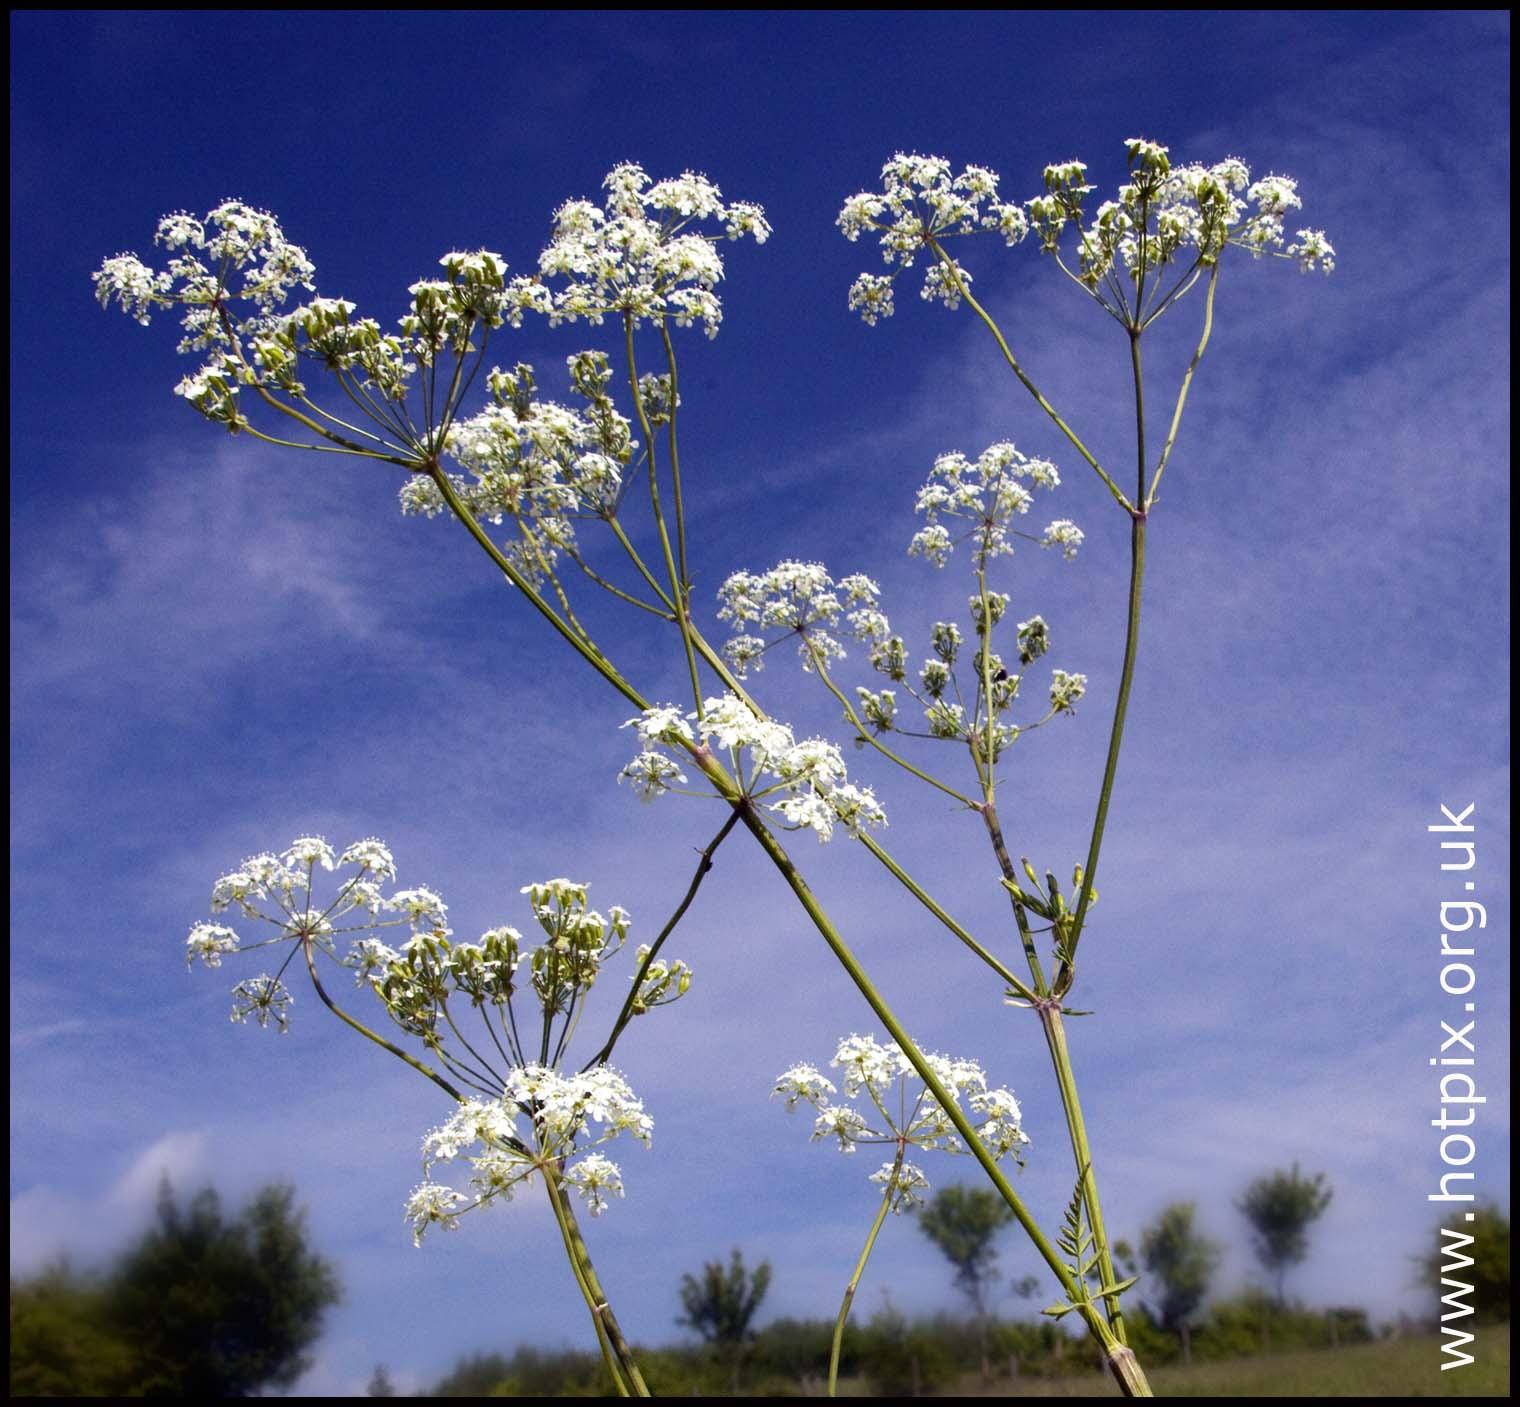 Wild,flower,flowers,nature,white,blue,weed,sky,england,britain,uk,GB,hotpix!